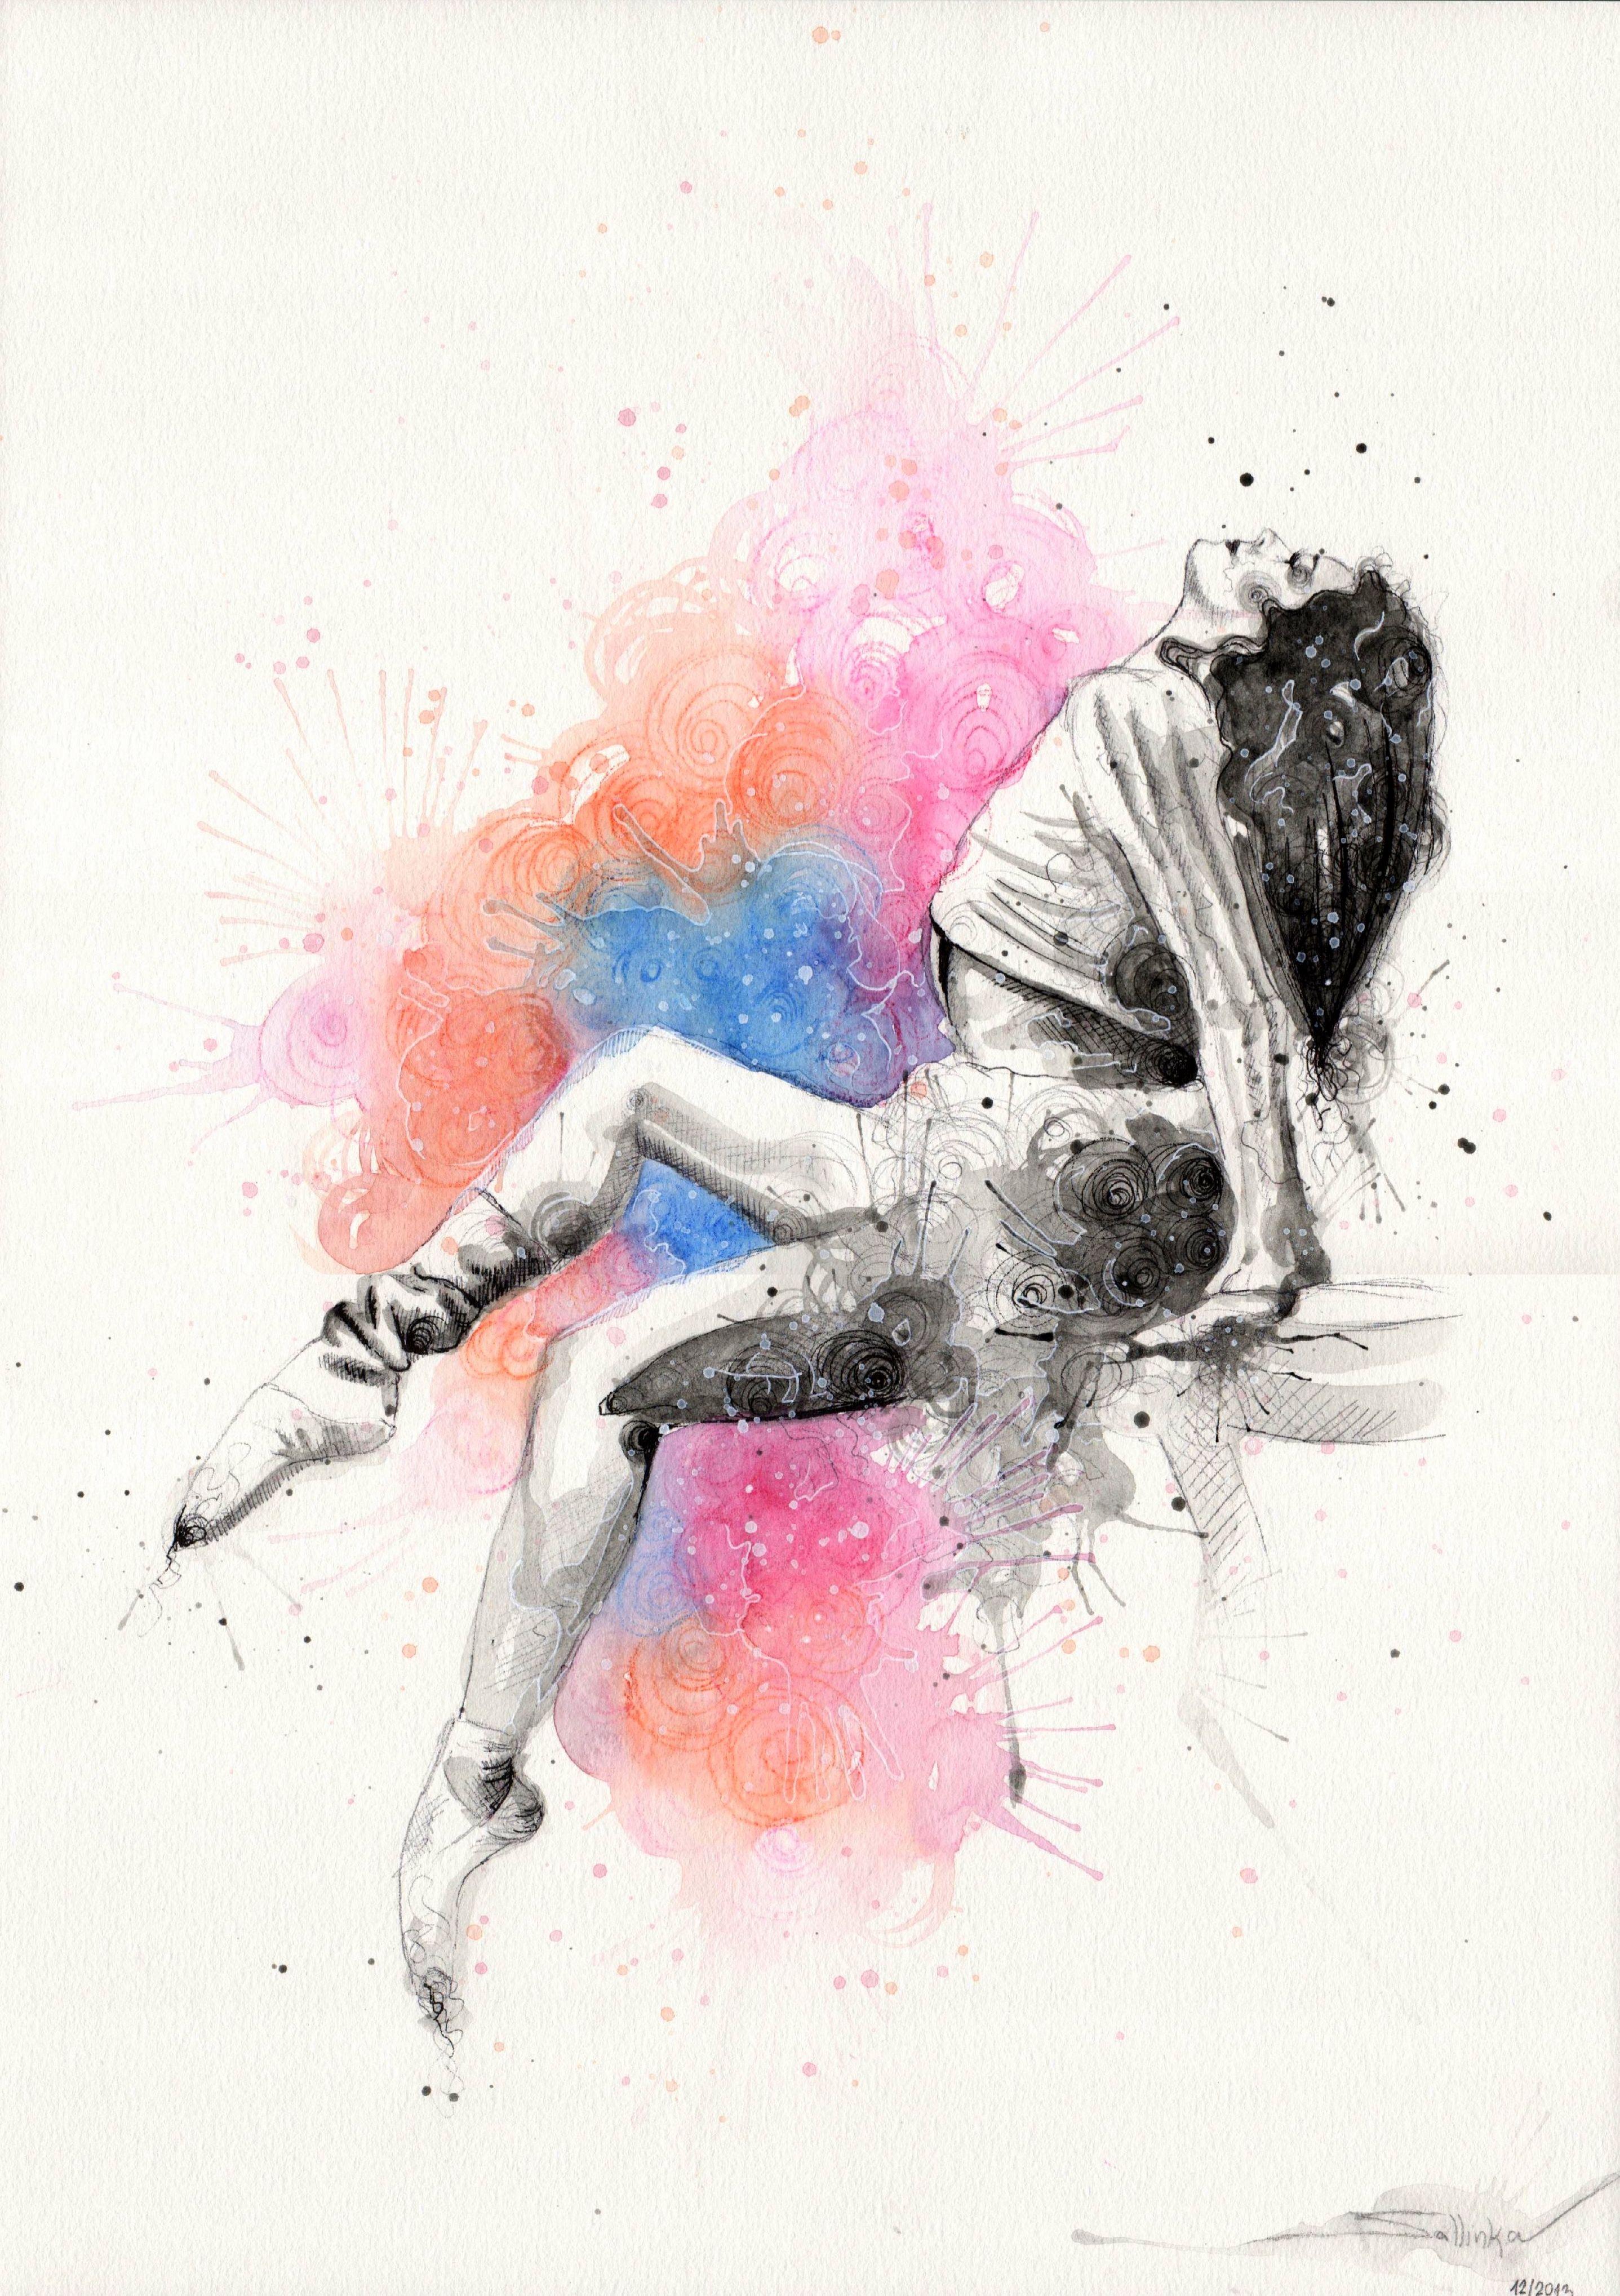 Ballerina | My watercolor works in 2019 | Ballet painting ...